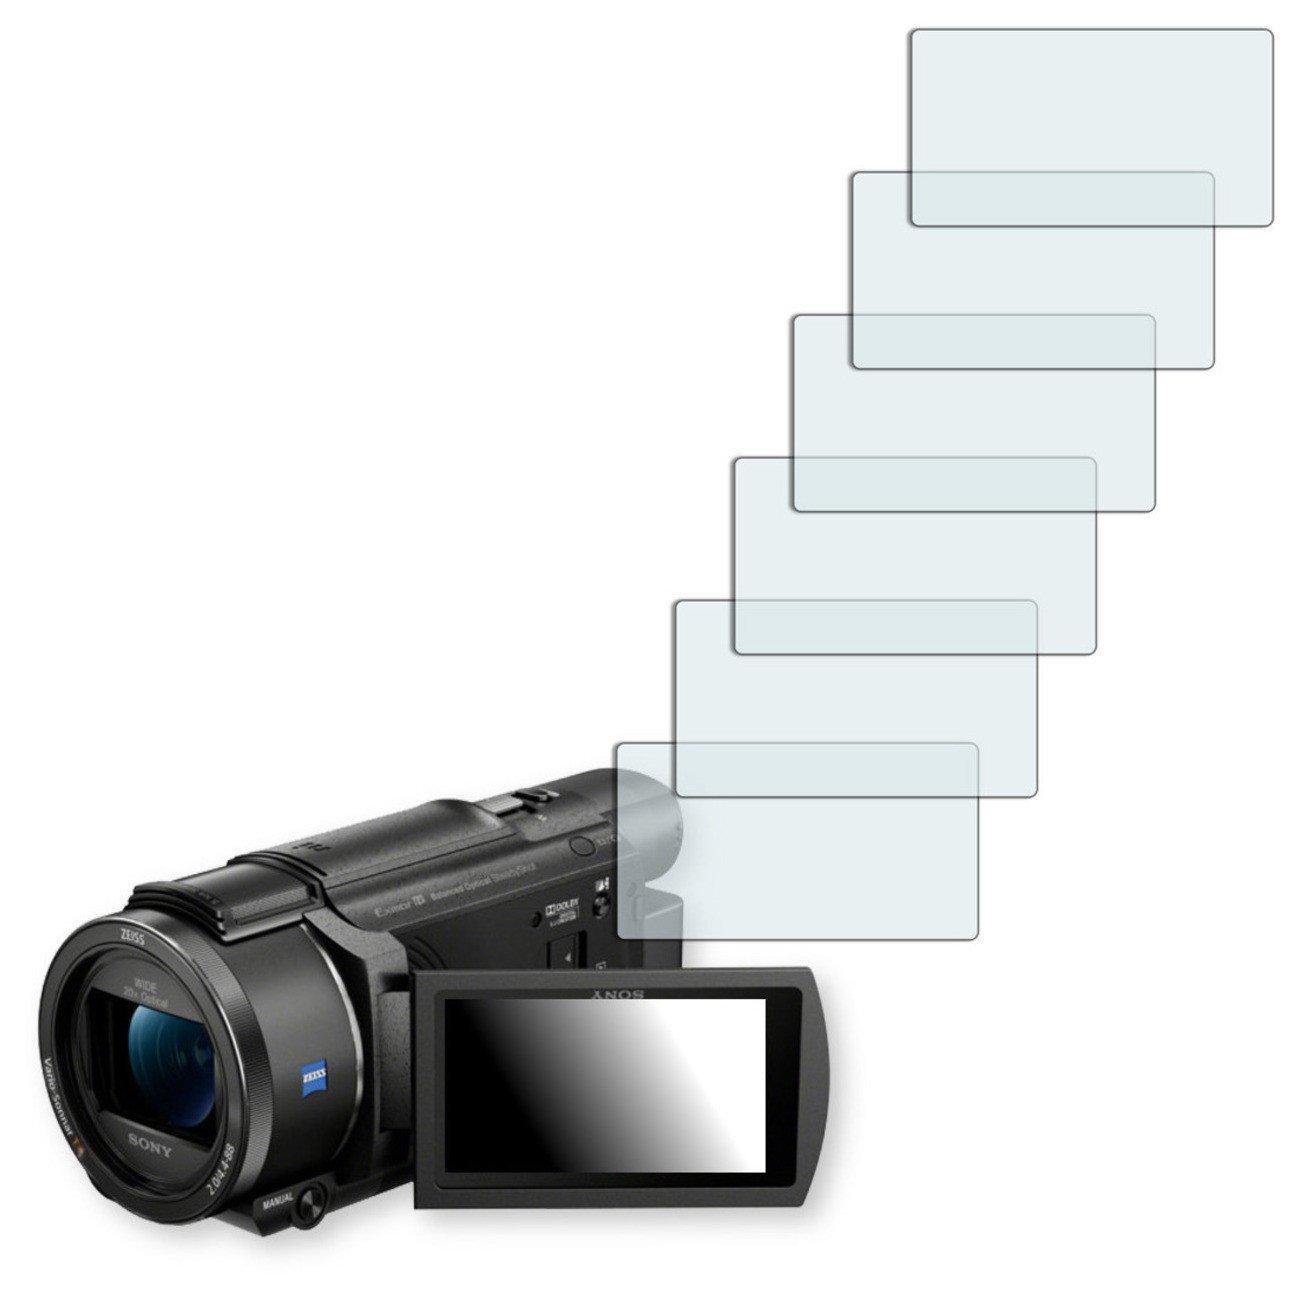 6x Golebo Semi-Matt protectores de pantalla para Sony FDR-AX53 - (efecto antirreflectante, montaje muy fá cil, removible sin residuos) montaje muy fácil DISAGU #xm6473_6